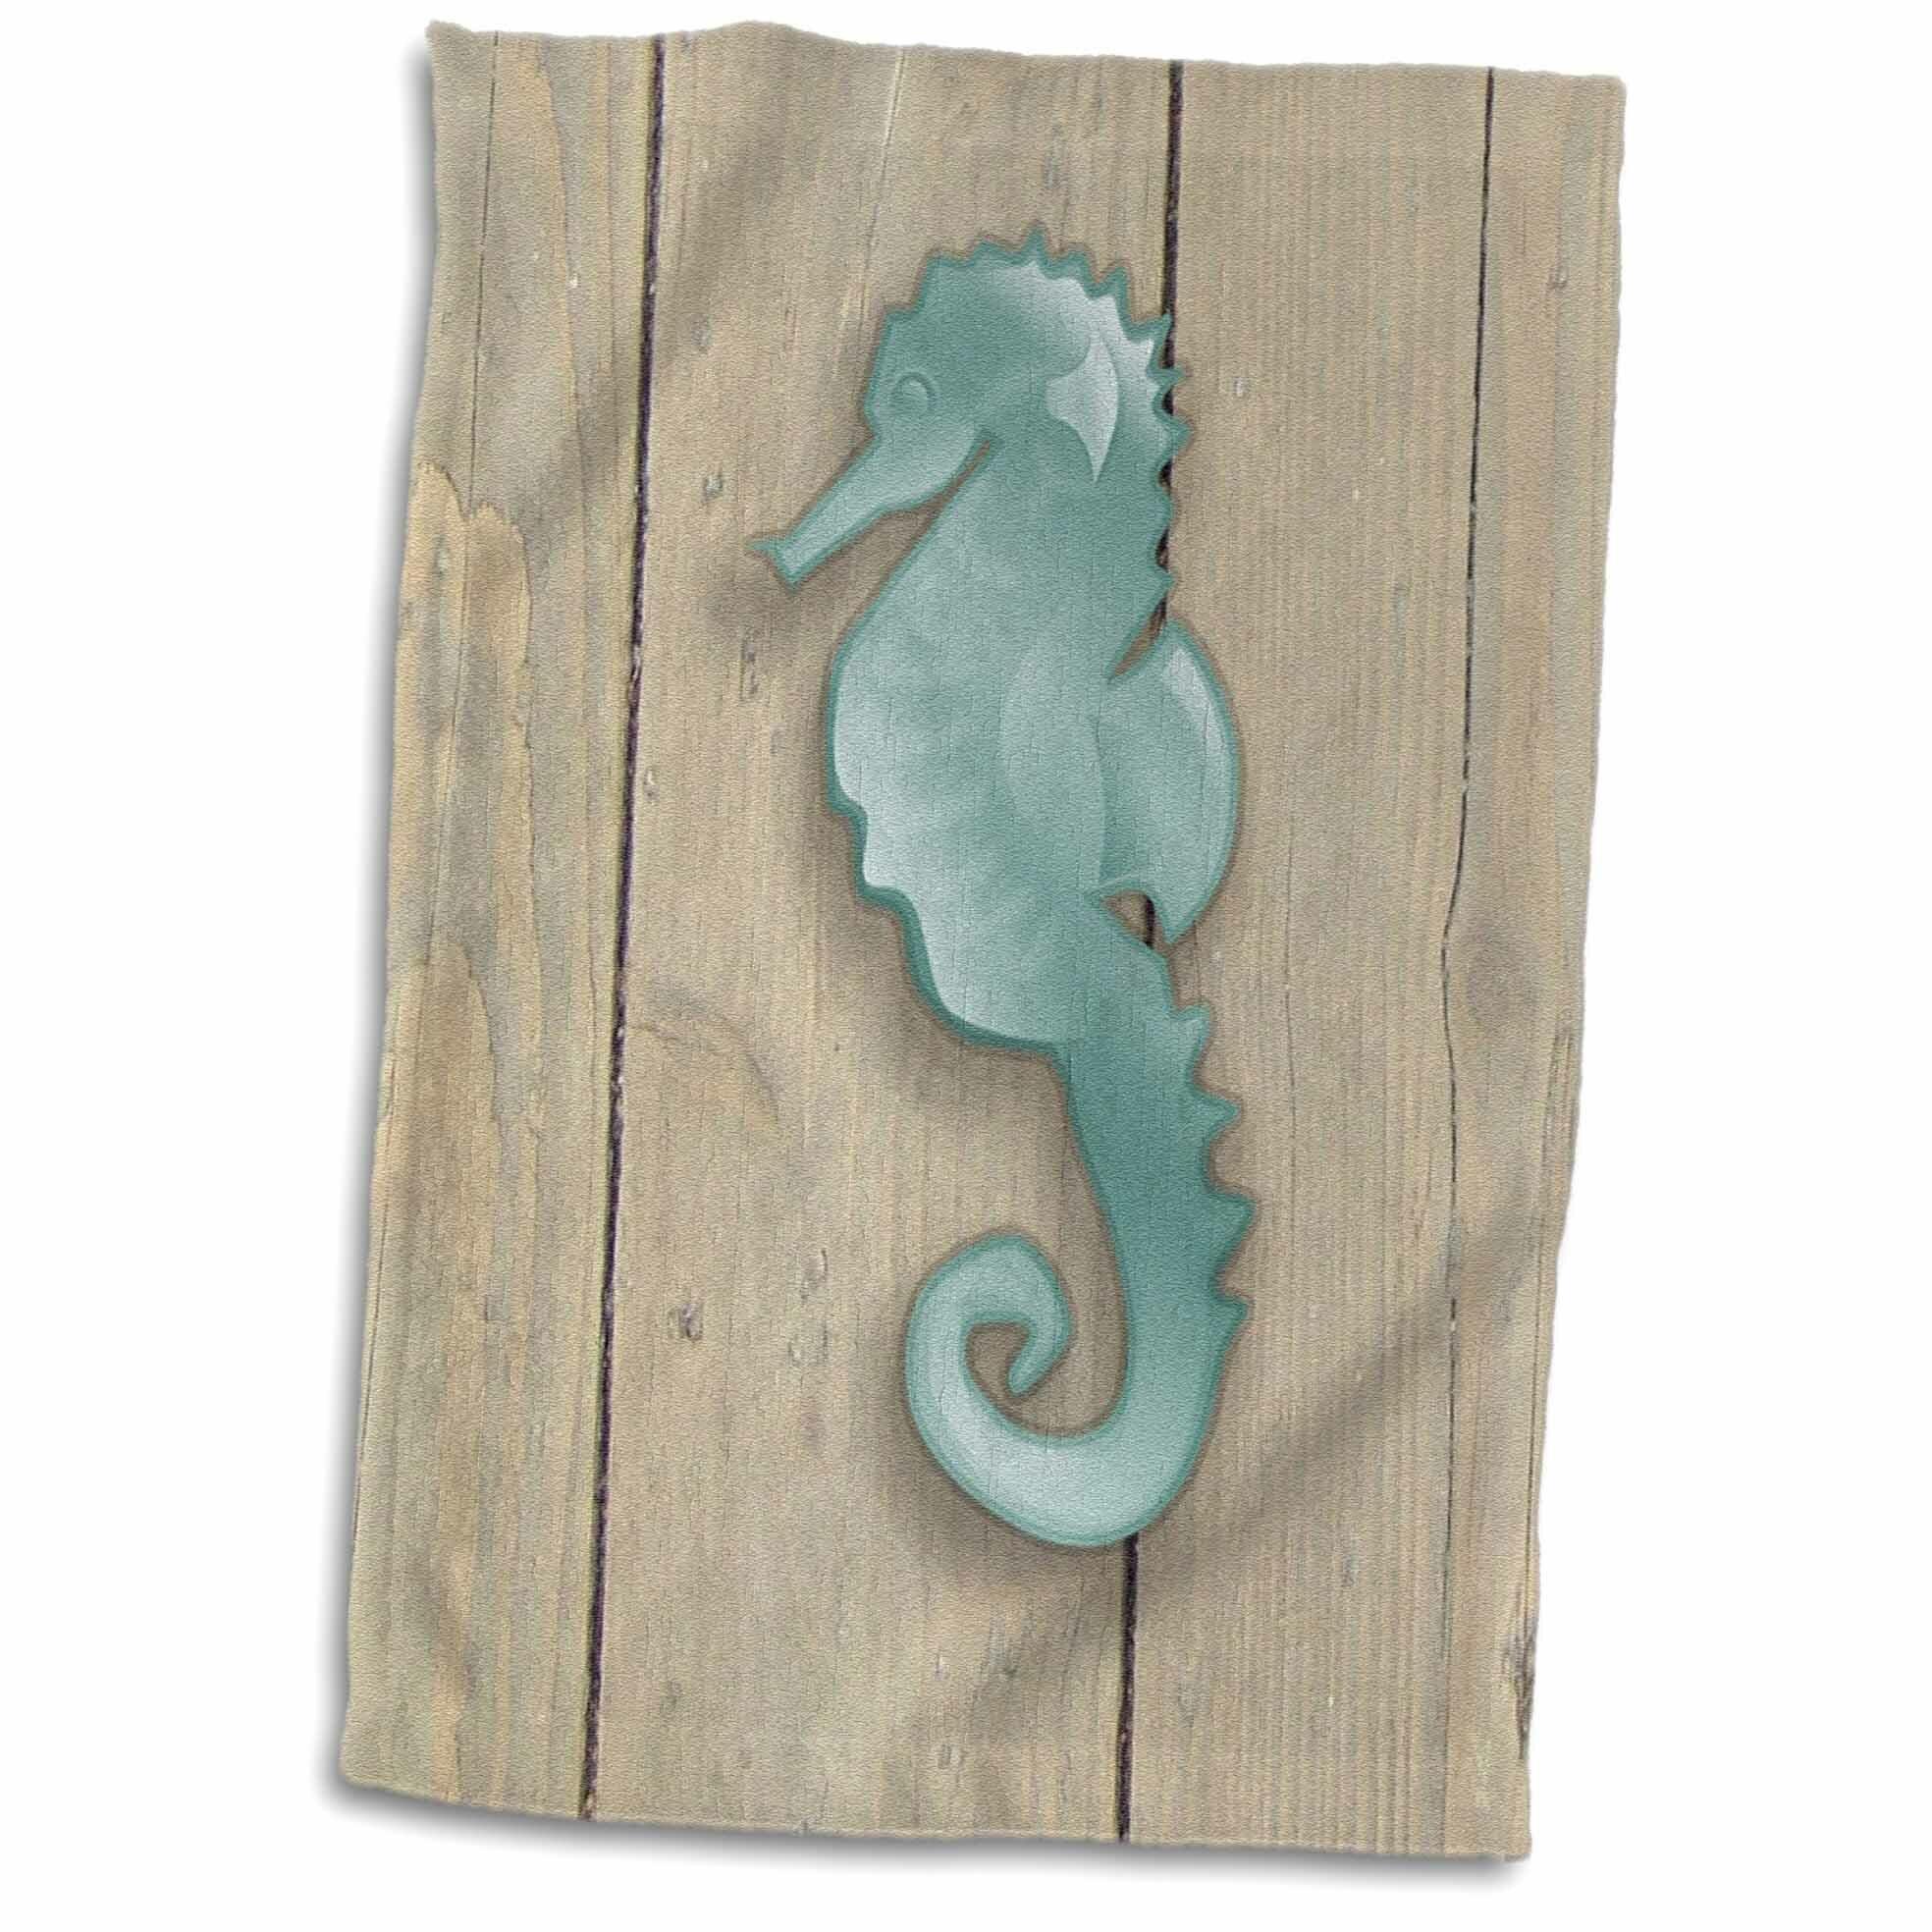 East Urban Home Dominik Image Of Cartoon Seahorse On Old Wooden Planks Hand Towel Wayfair